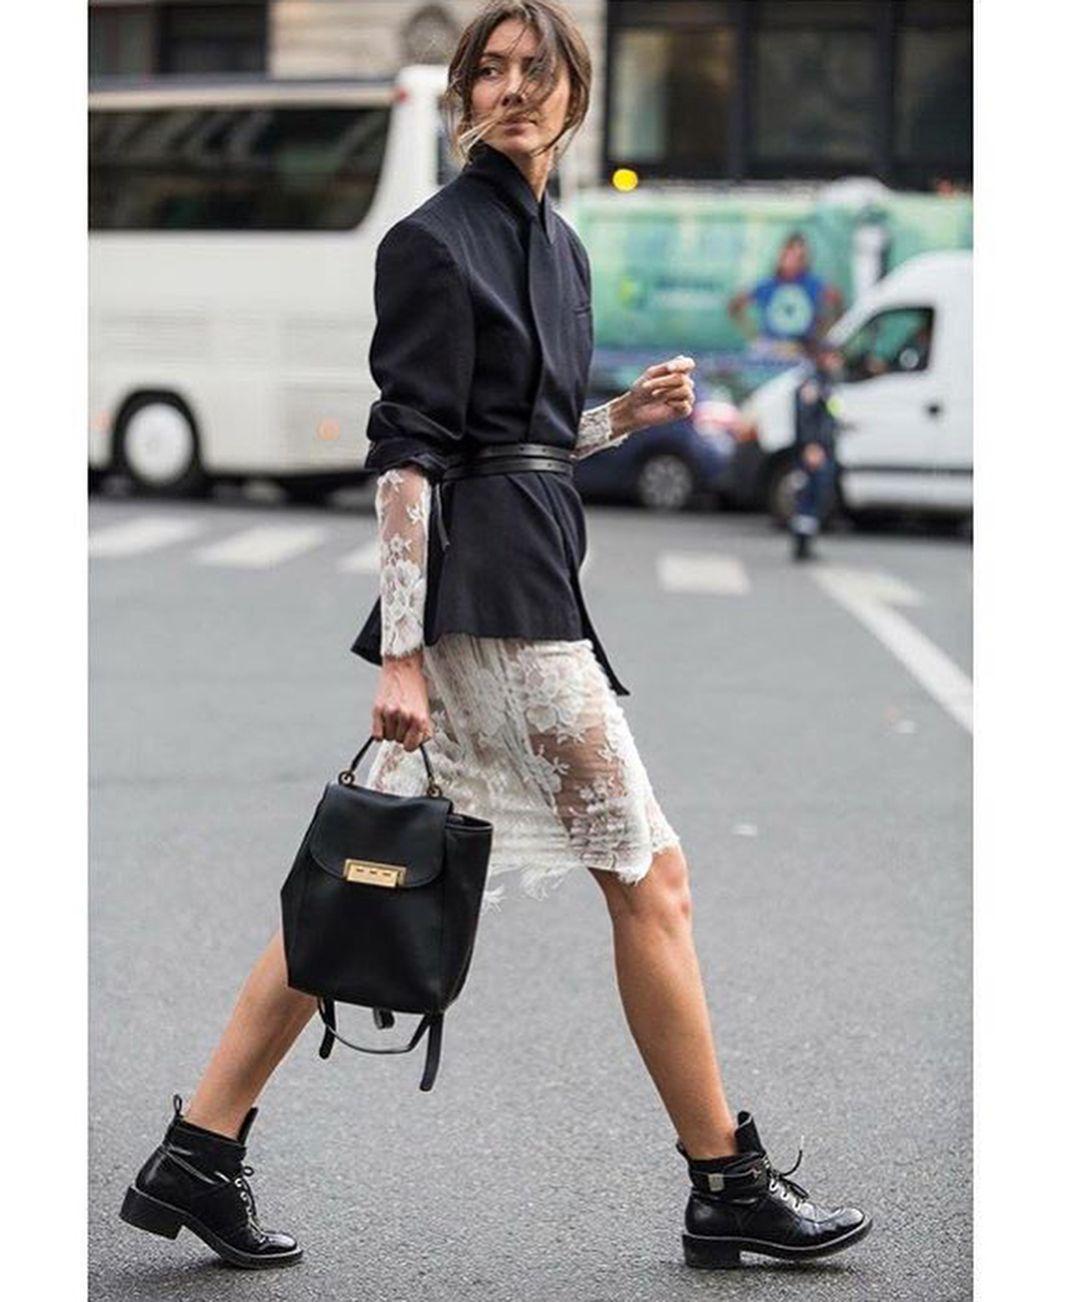 Tipswinter Fashion skirt outfits new photo